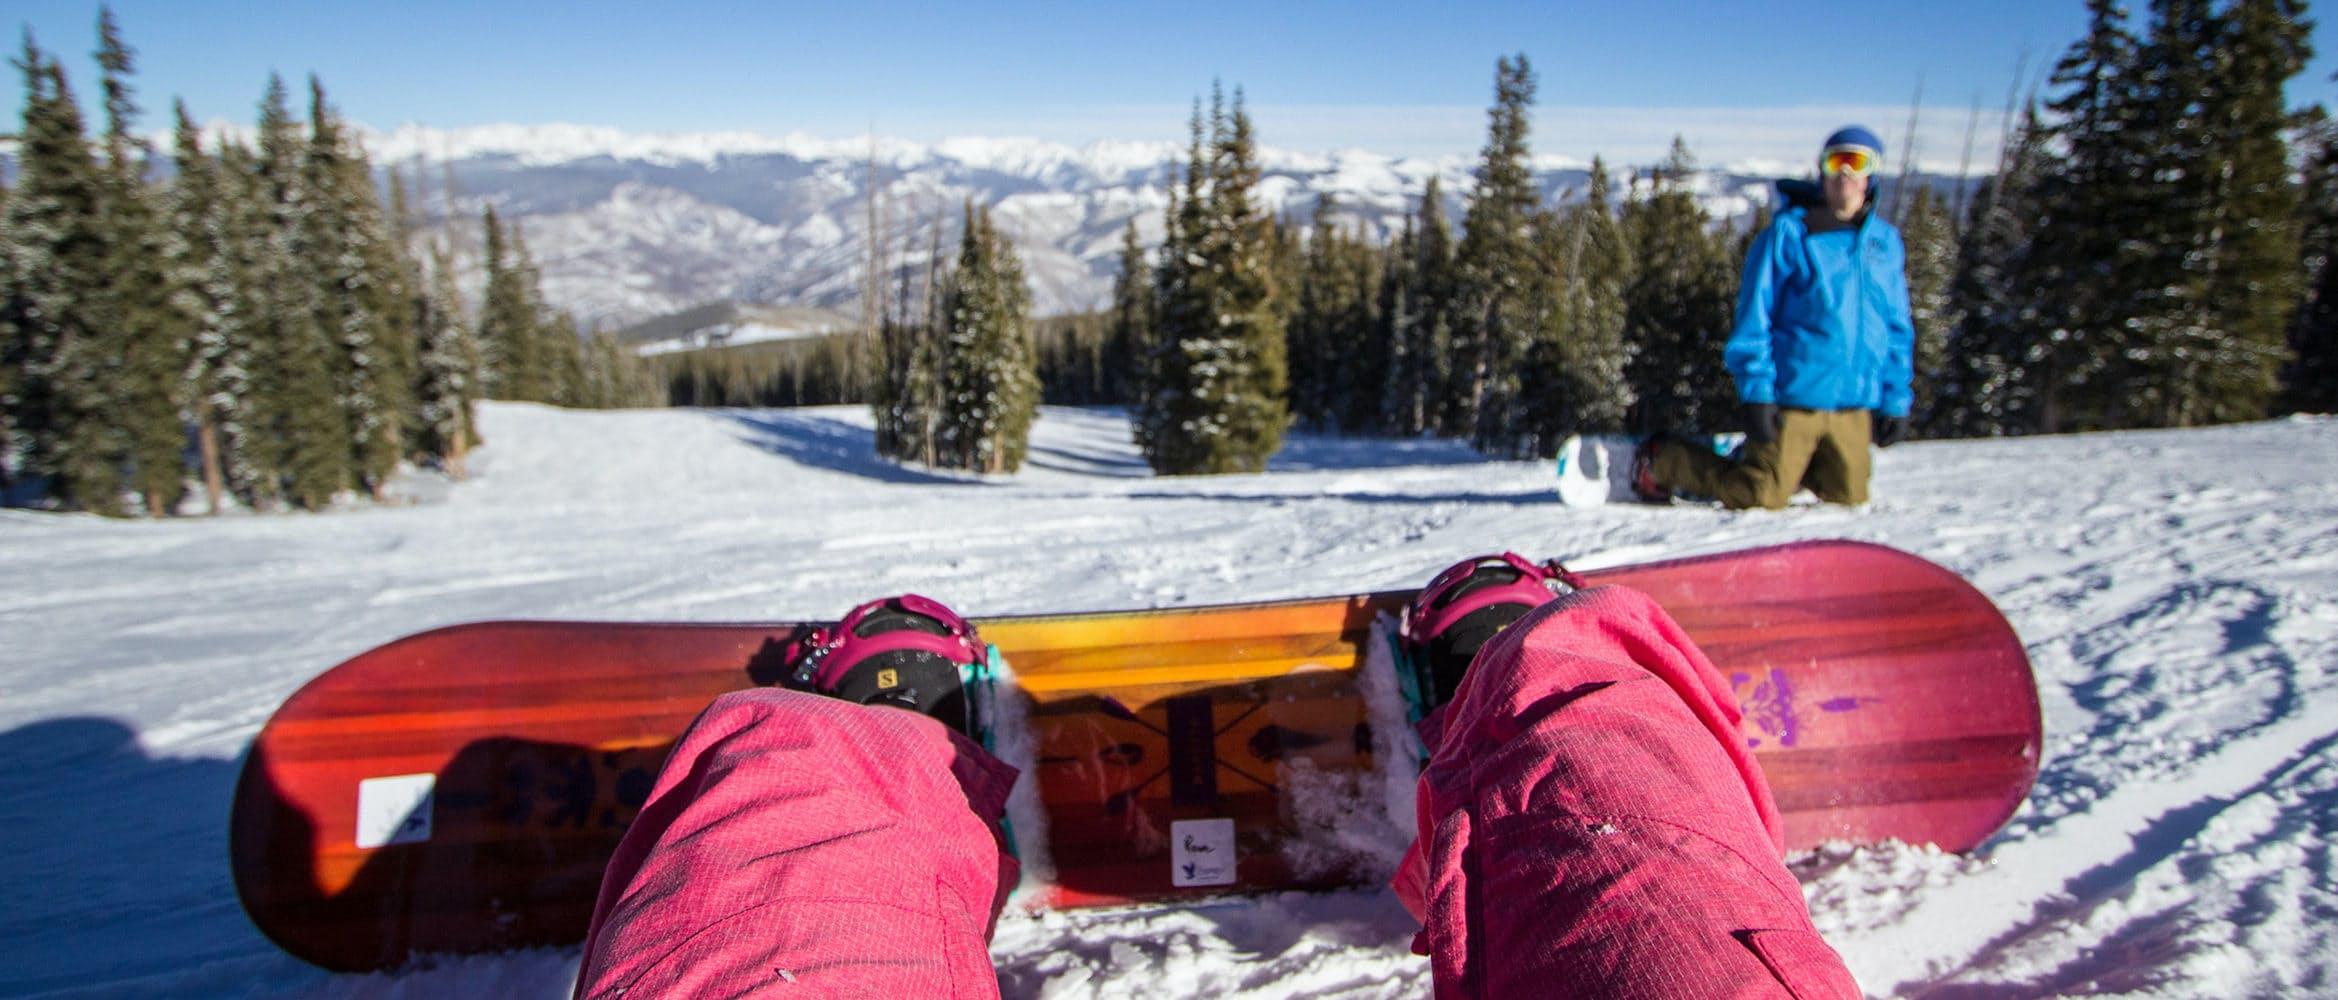 Featured 2x huckberry learning how to snowboard bryan rowe 7.jpg?ixlib=rails 2.1